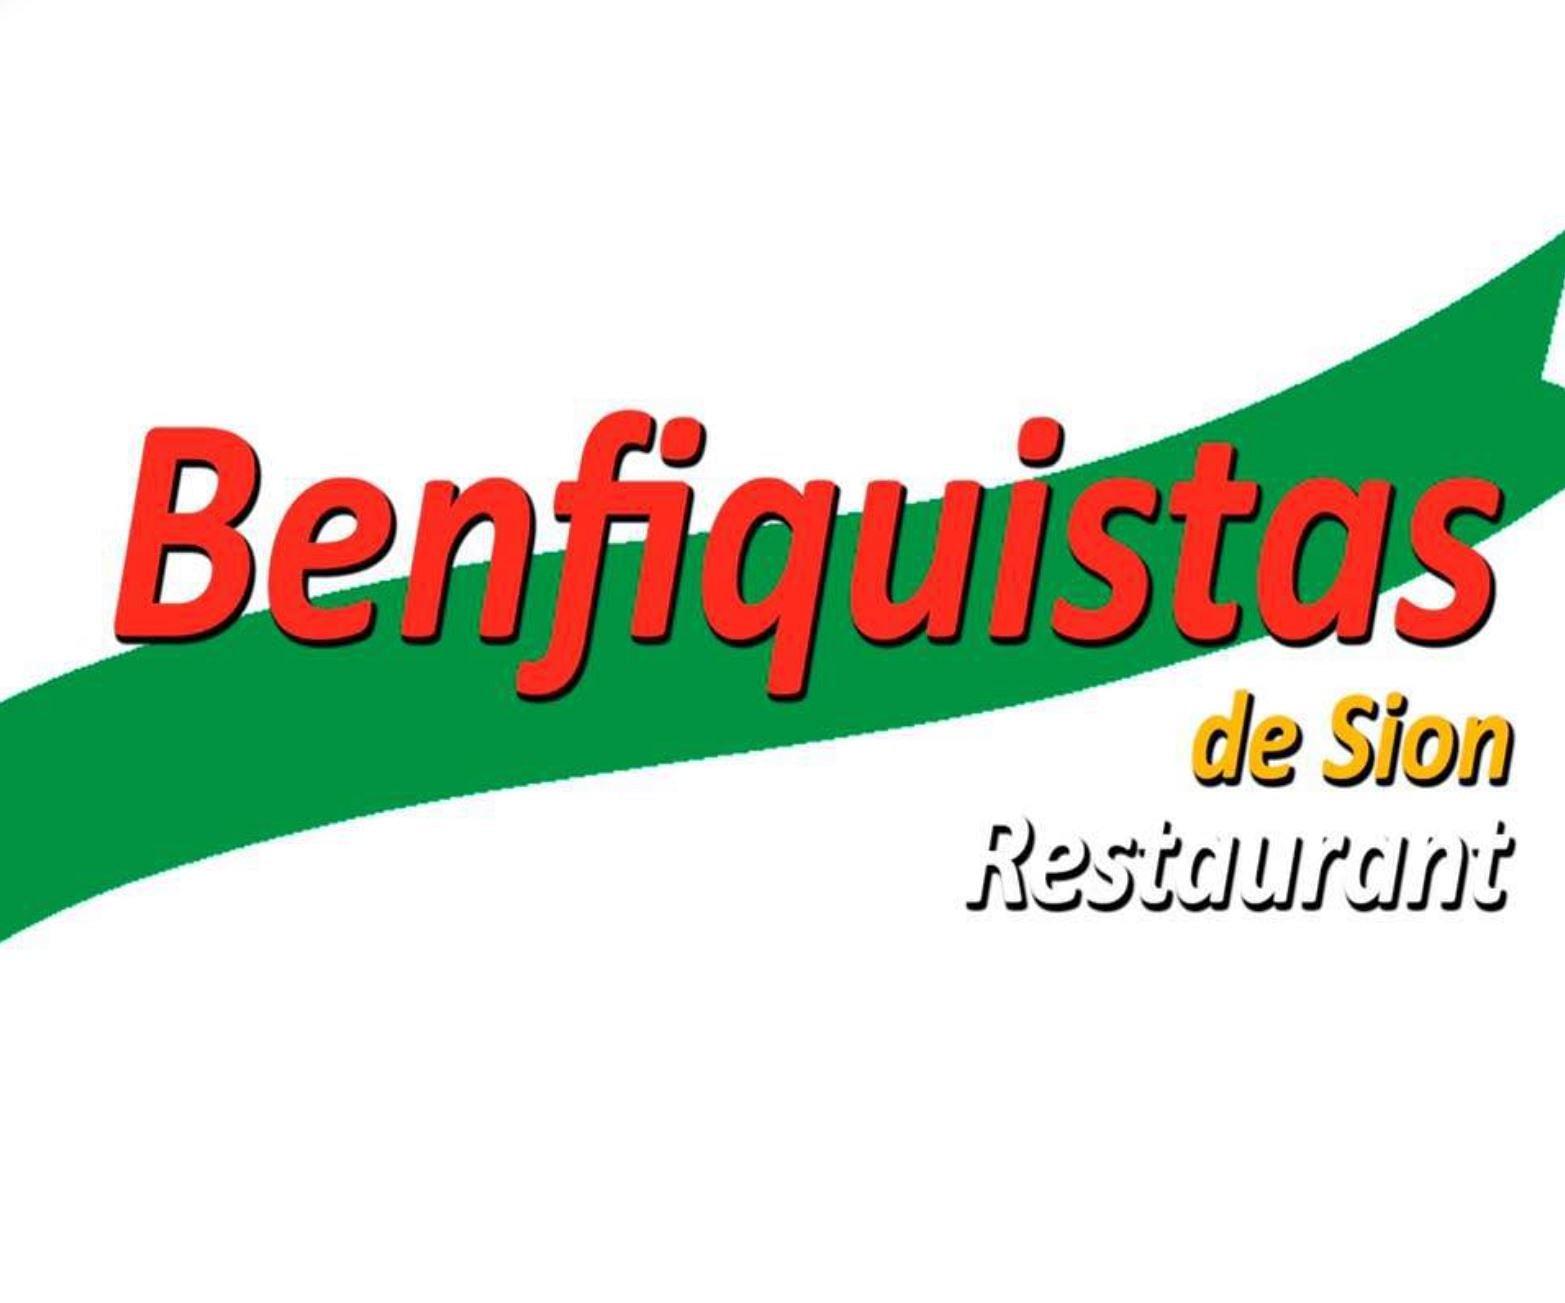 Restaurant benfiquistas